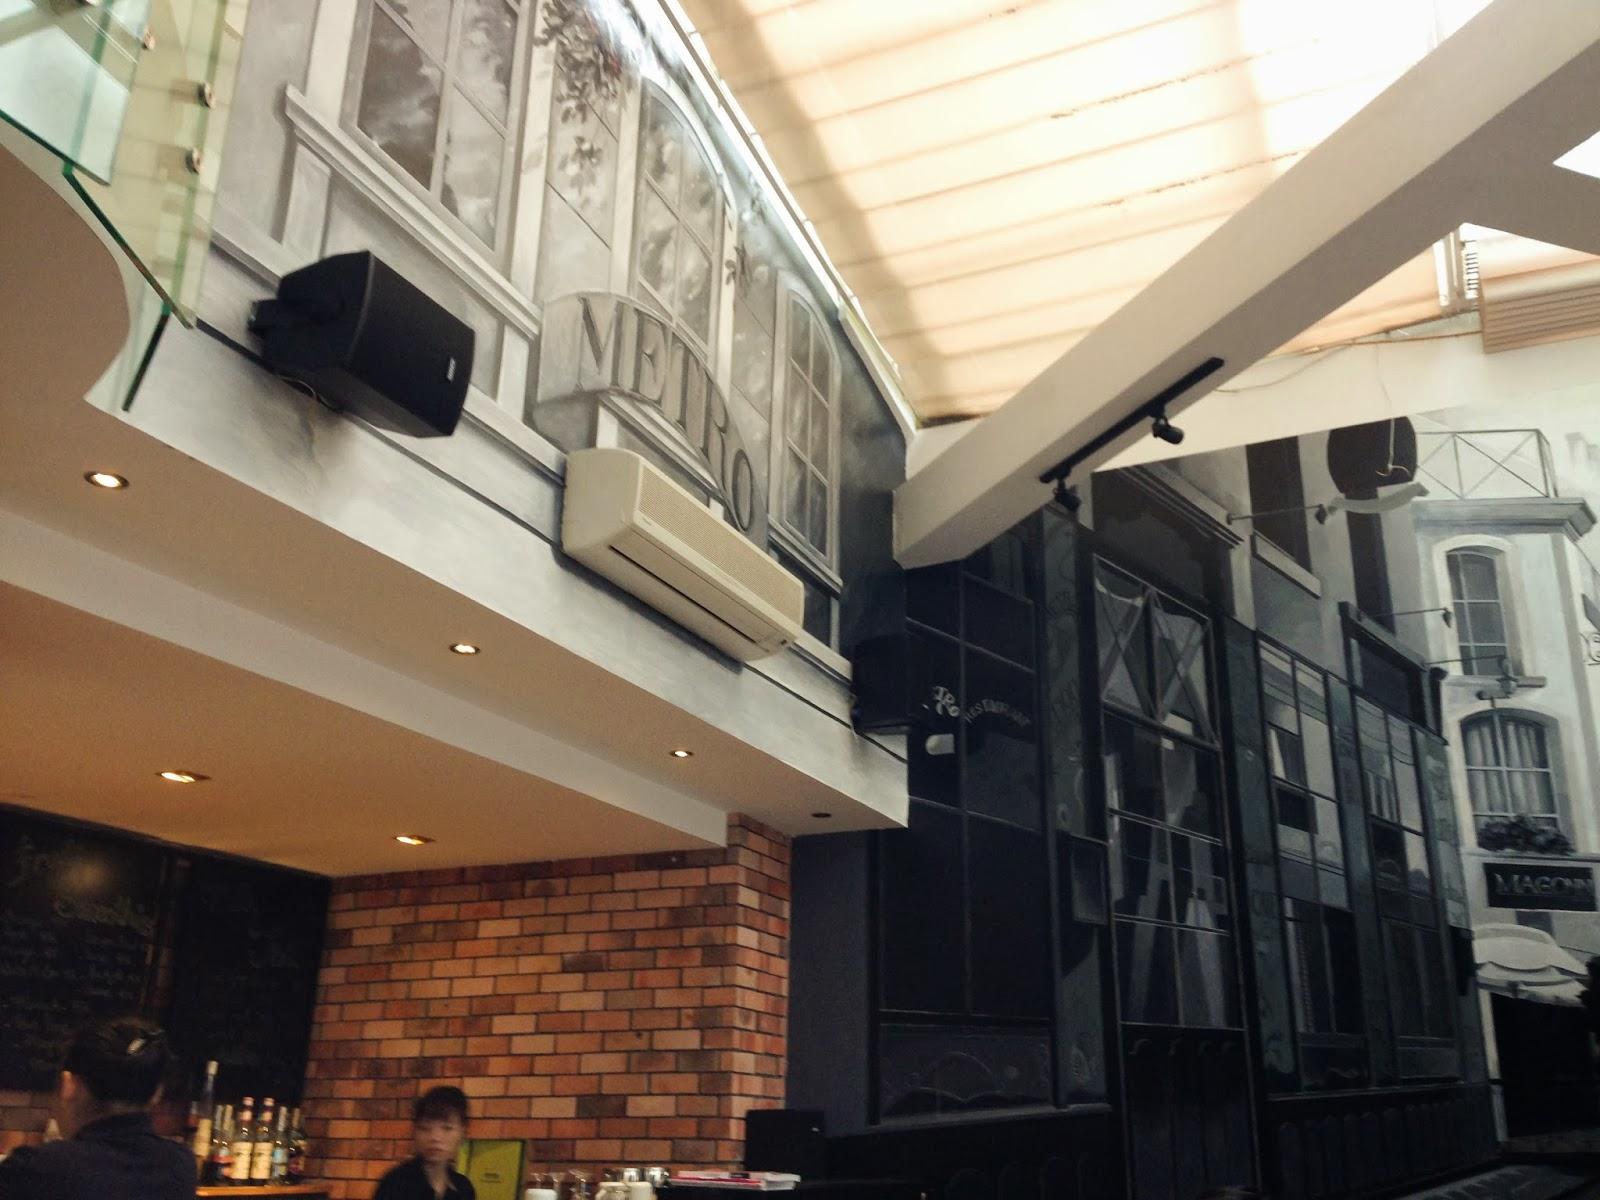 METROCAFE-hanoi-vietnam メトロカフェ店内2